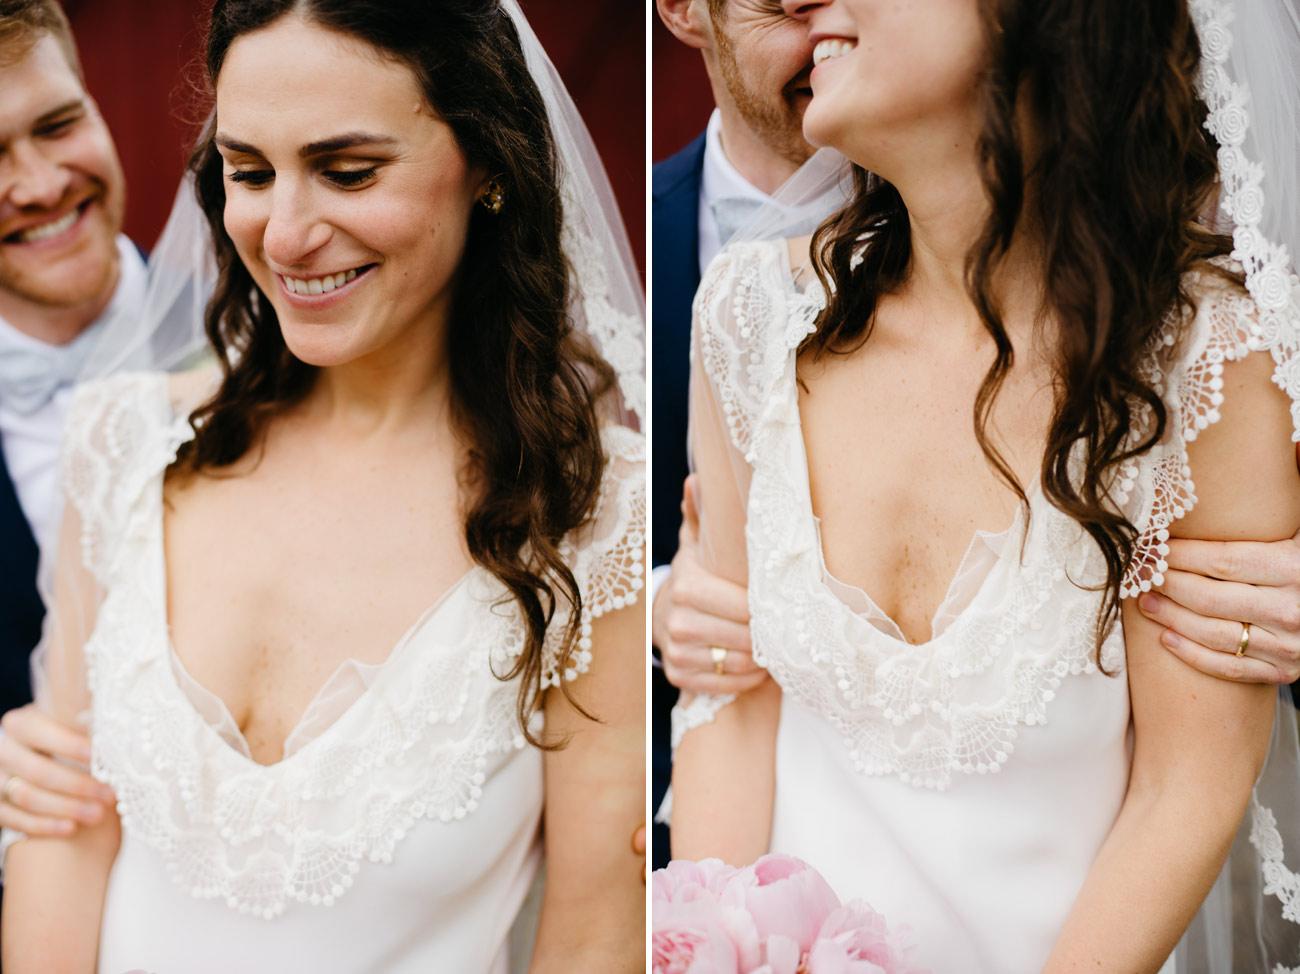 woodstock vermont weddings for brooklyn brides